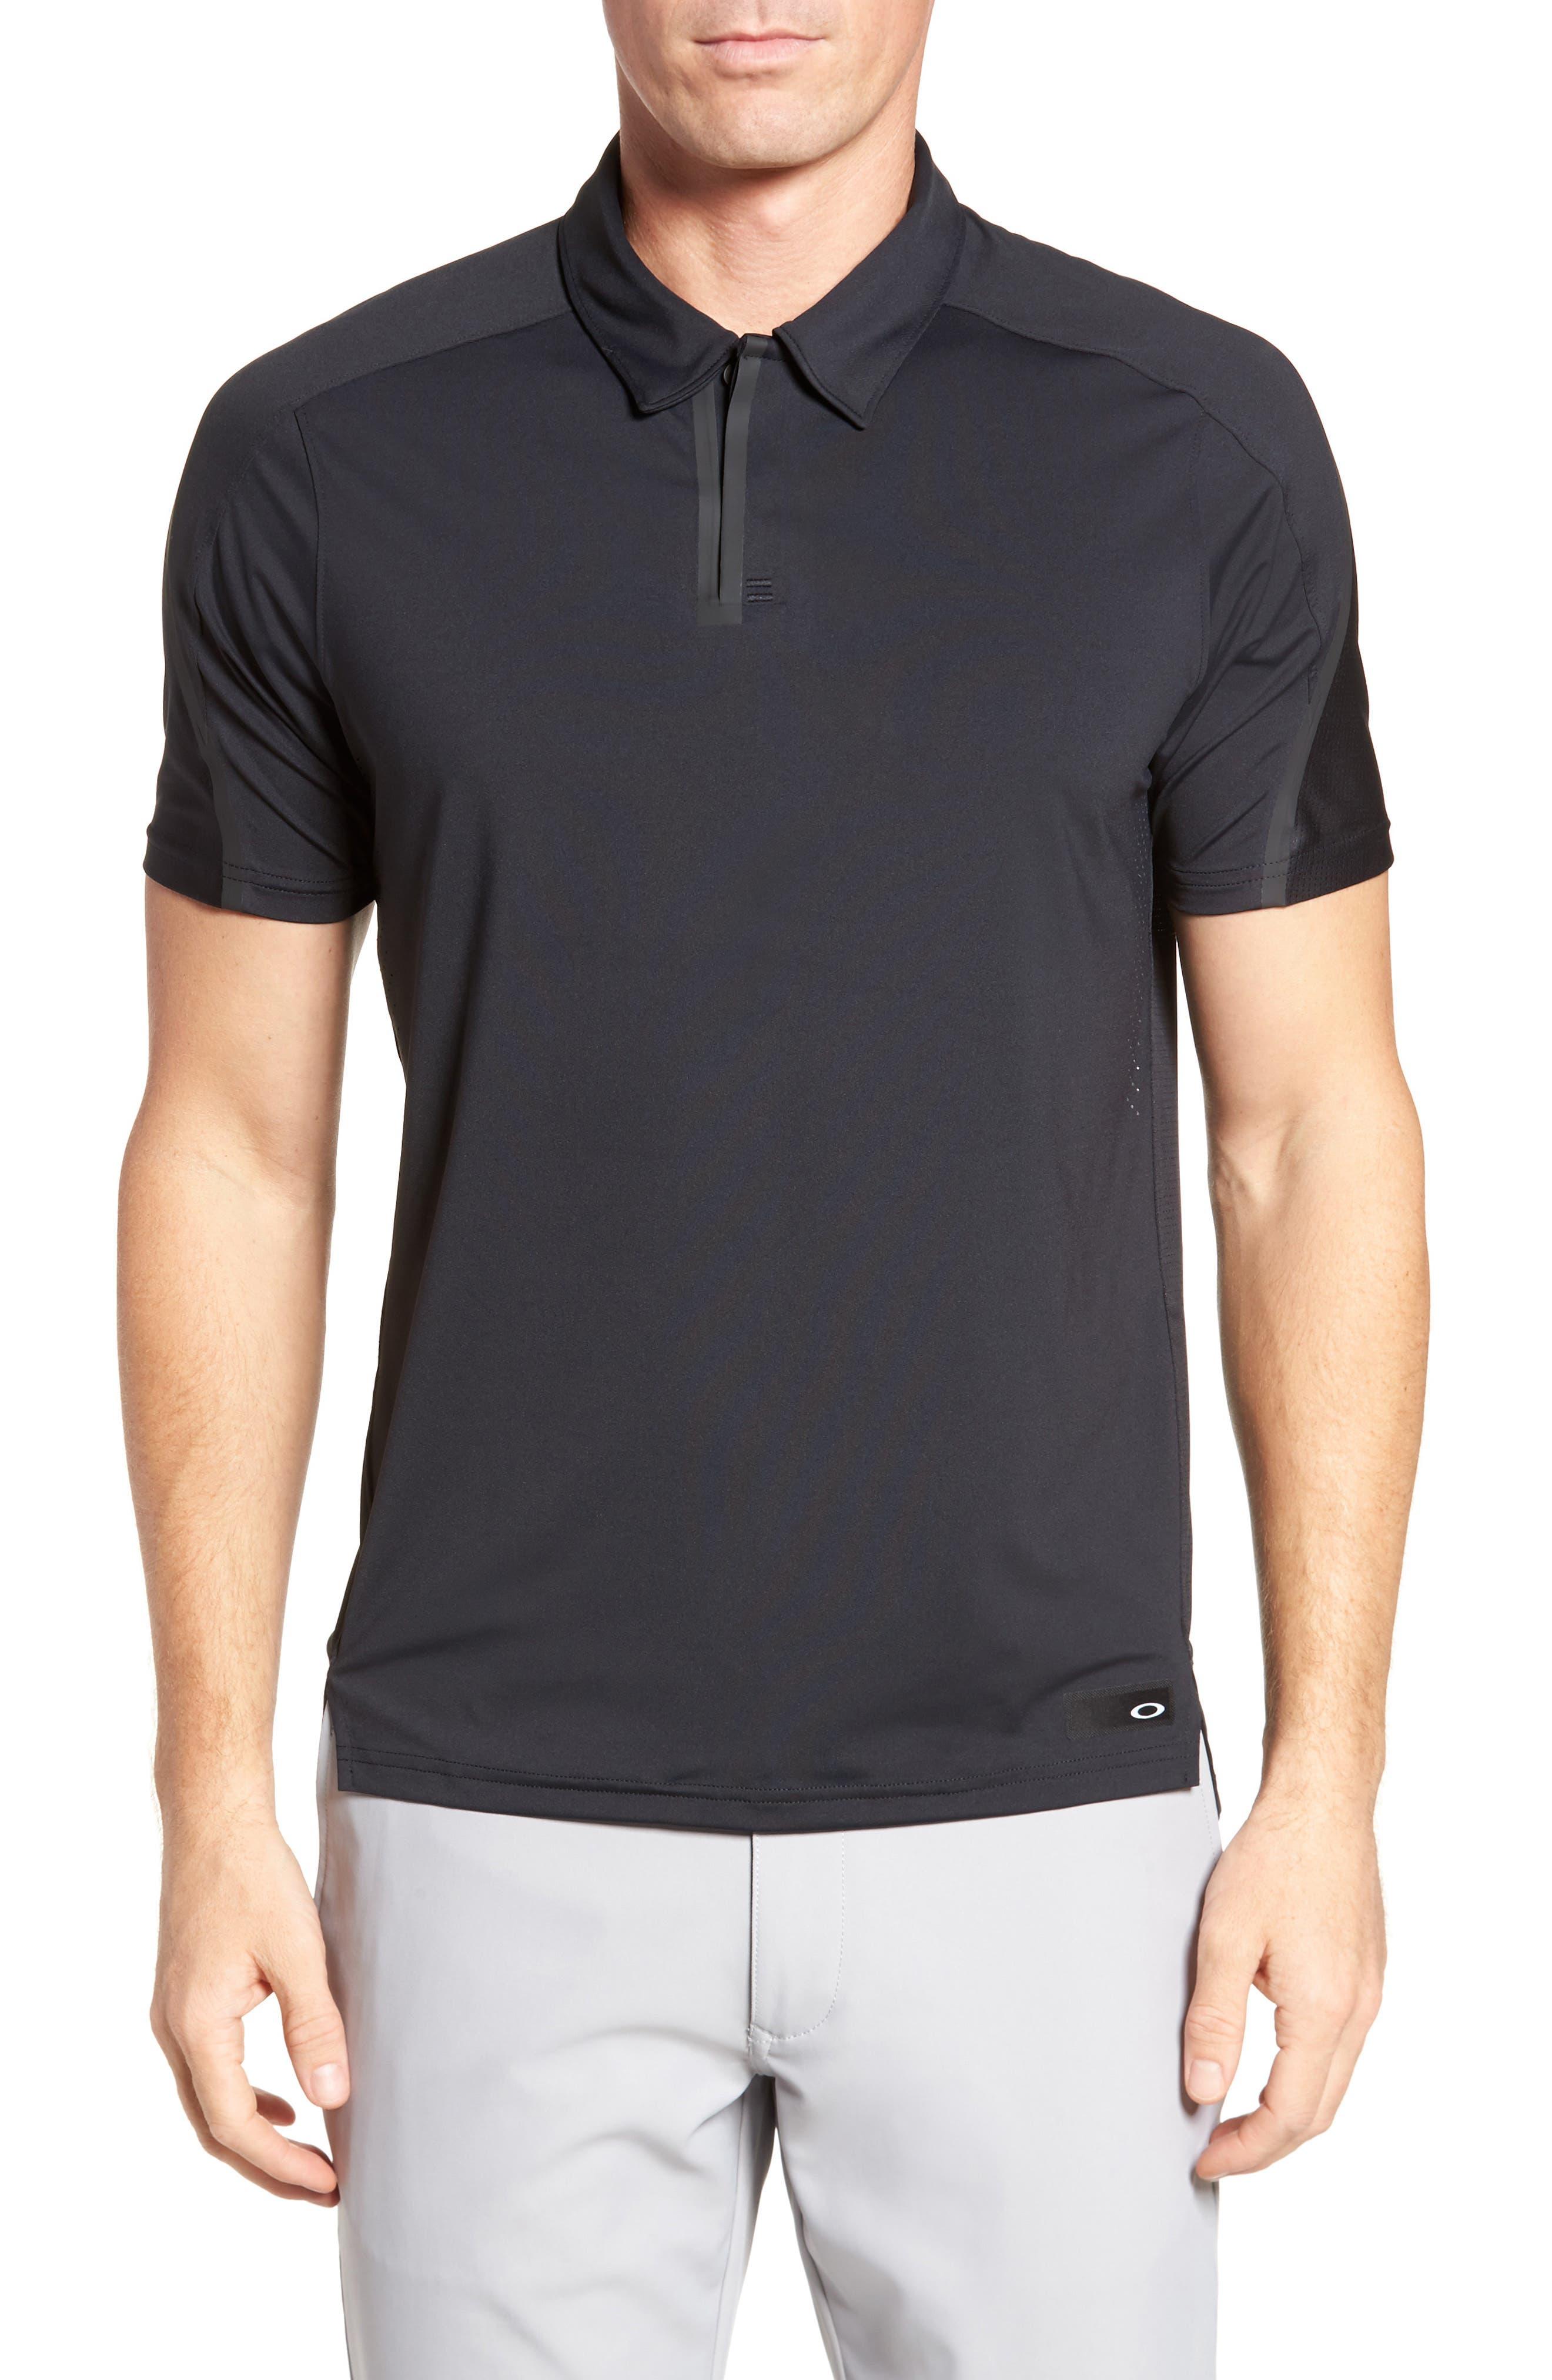 Velocity Polo Shirt,                             Main thumbnail 1, color,                             001